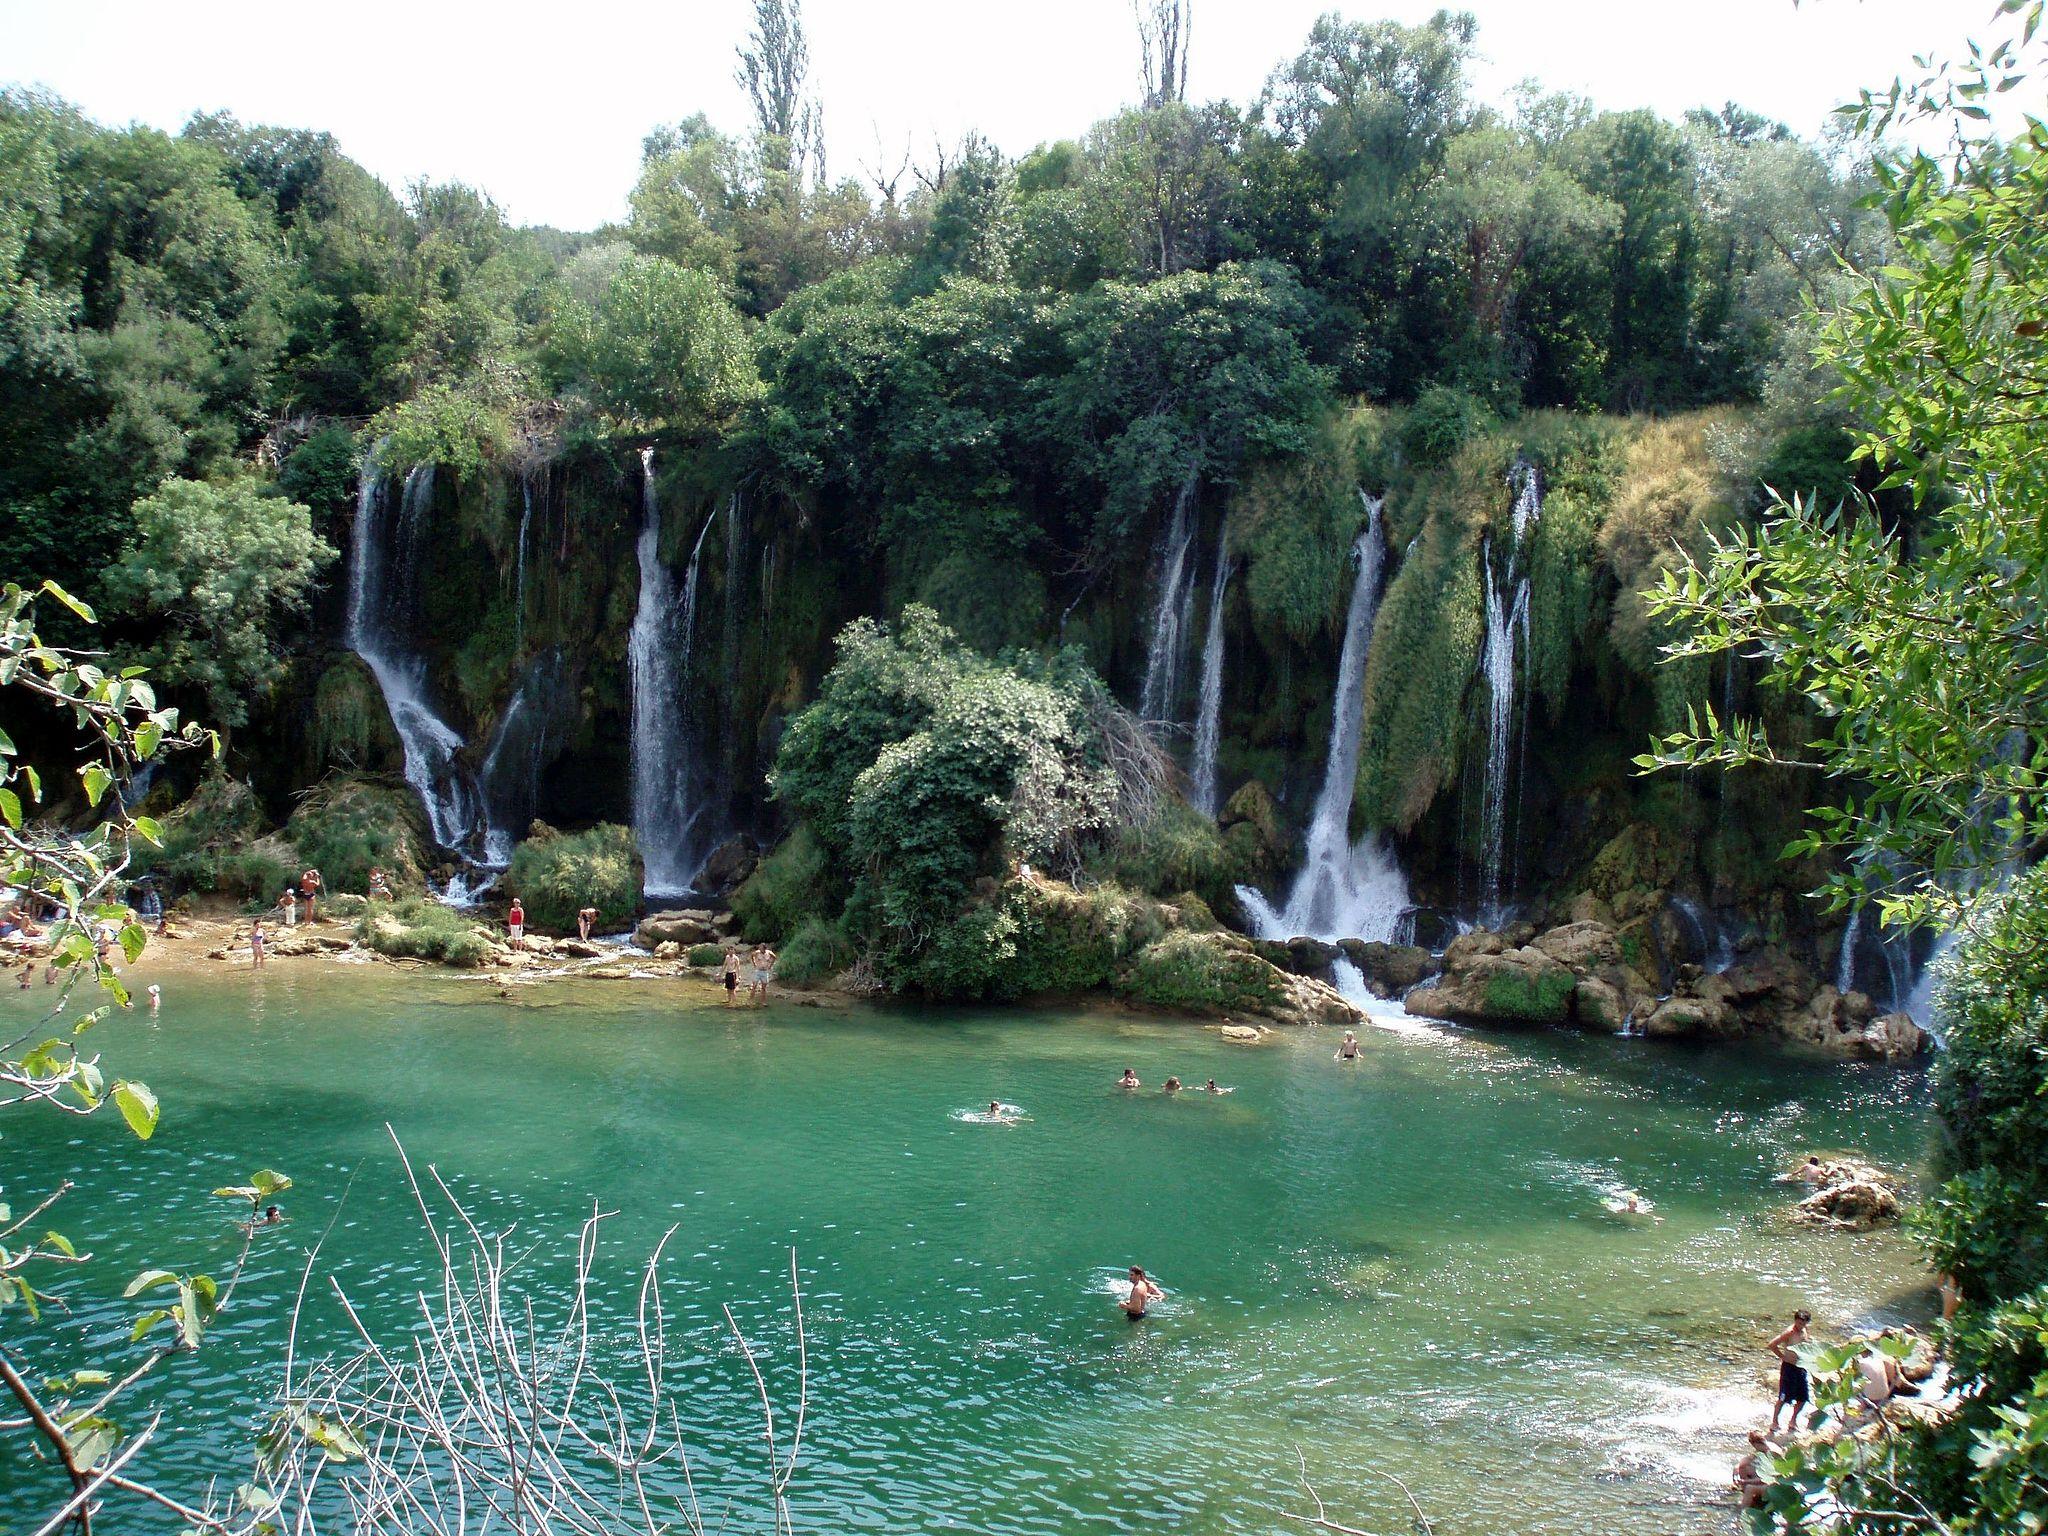 Kravica_waterfall_(204058333)